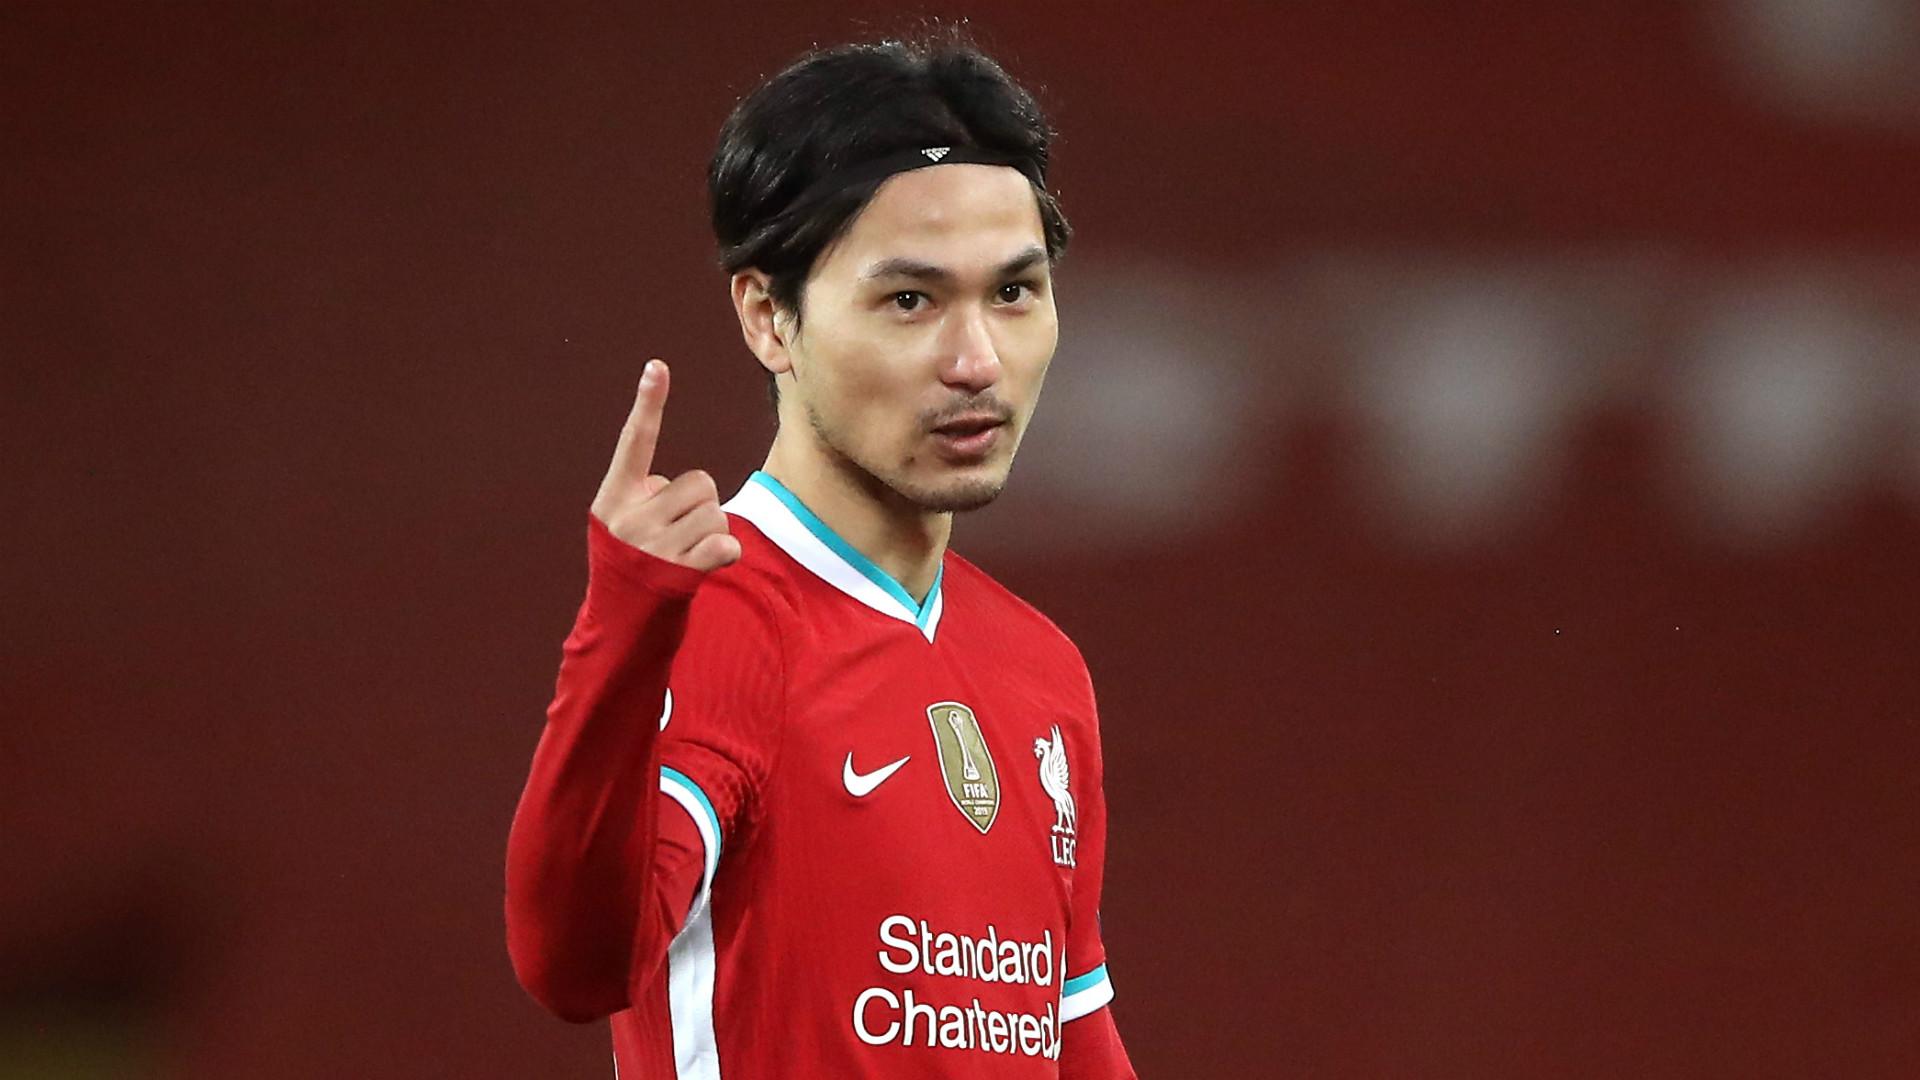 'I don't know what will happen' - Minamino unsure on Liverpool future